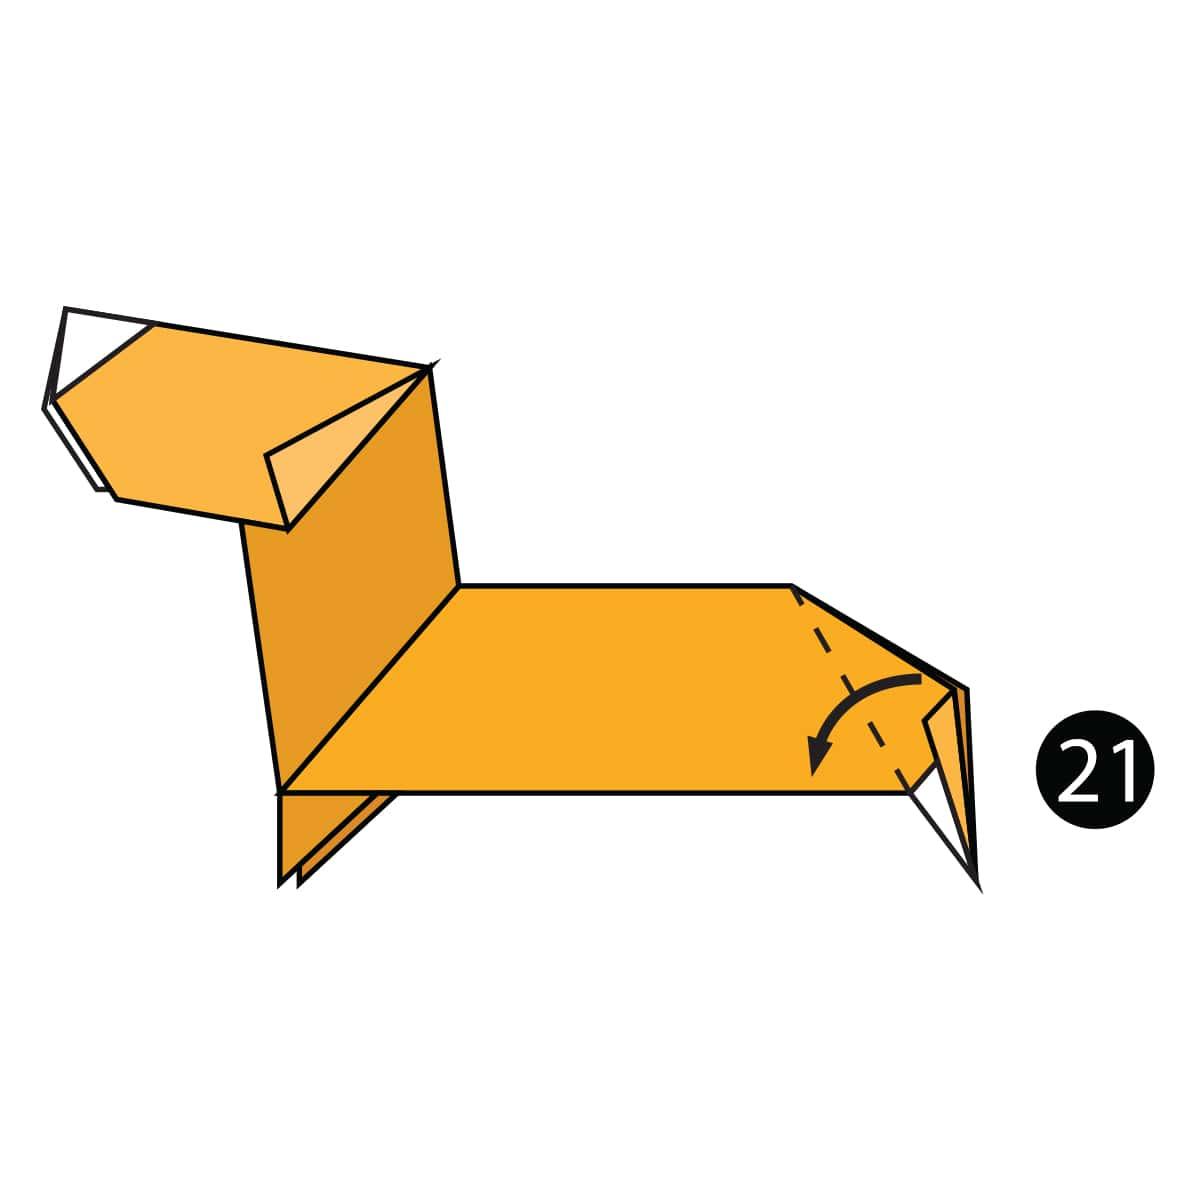 Dachshund Step 21